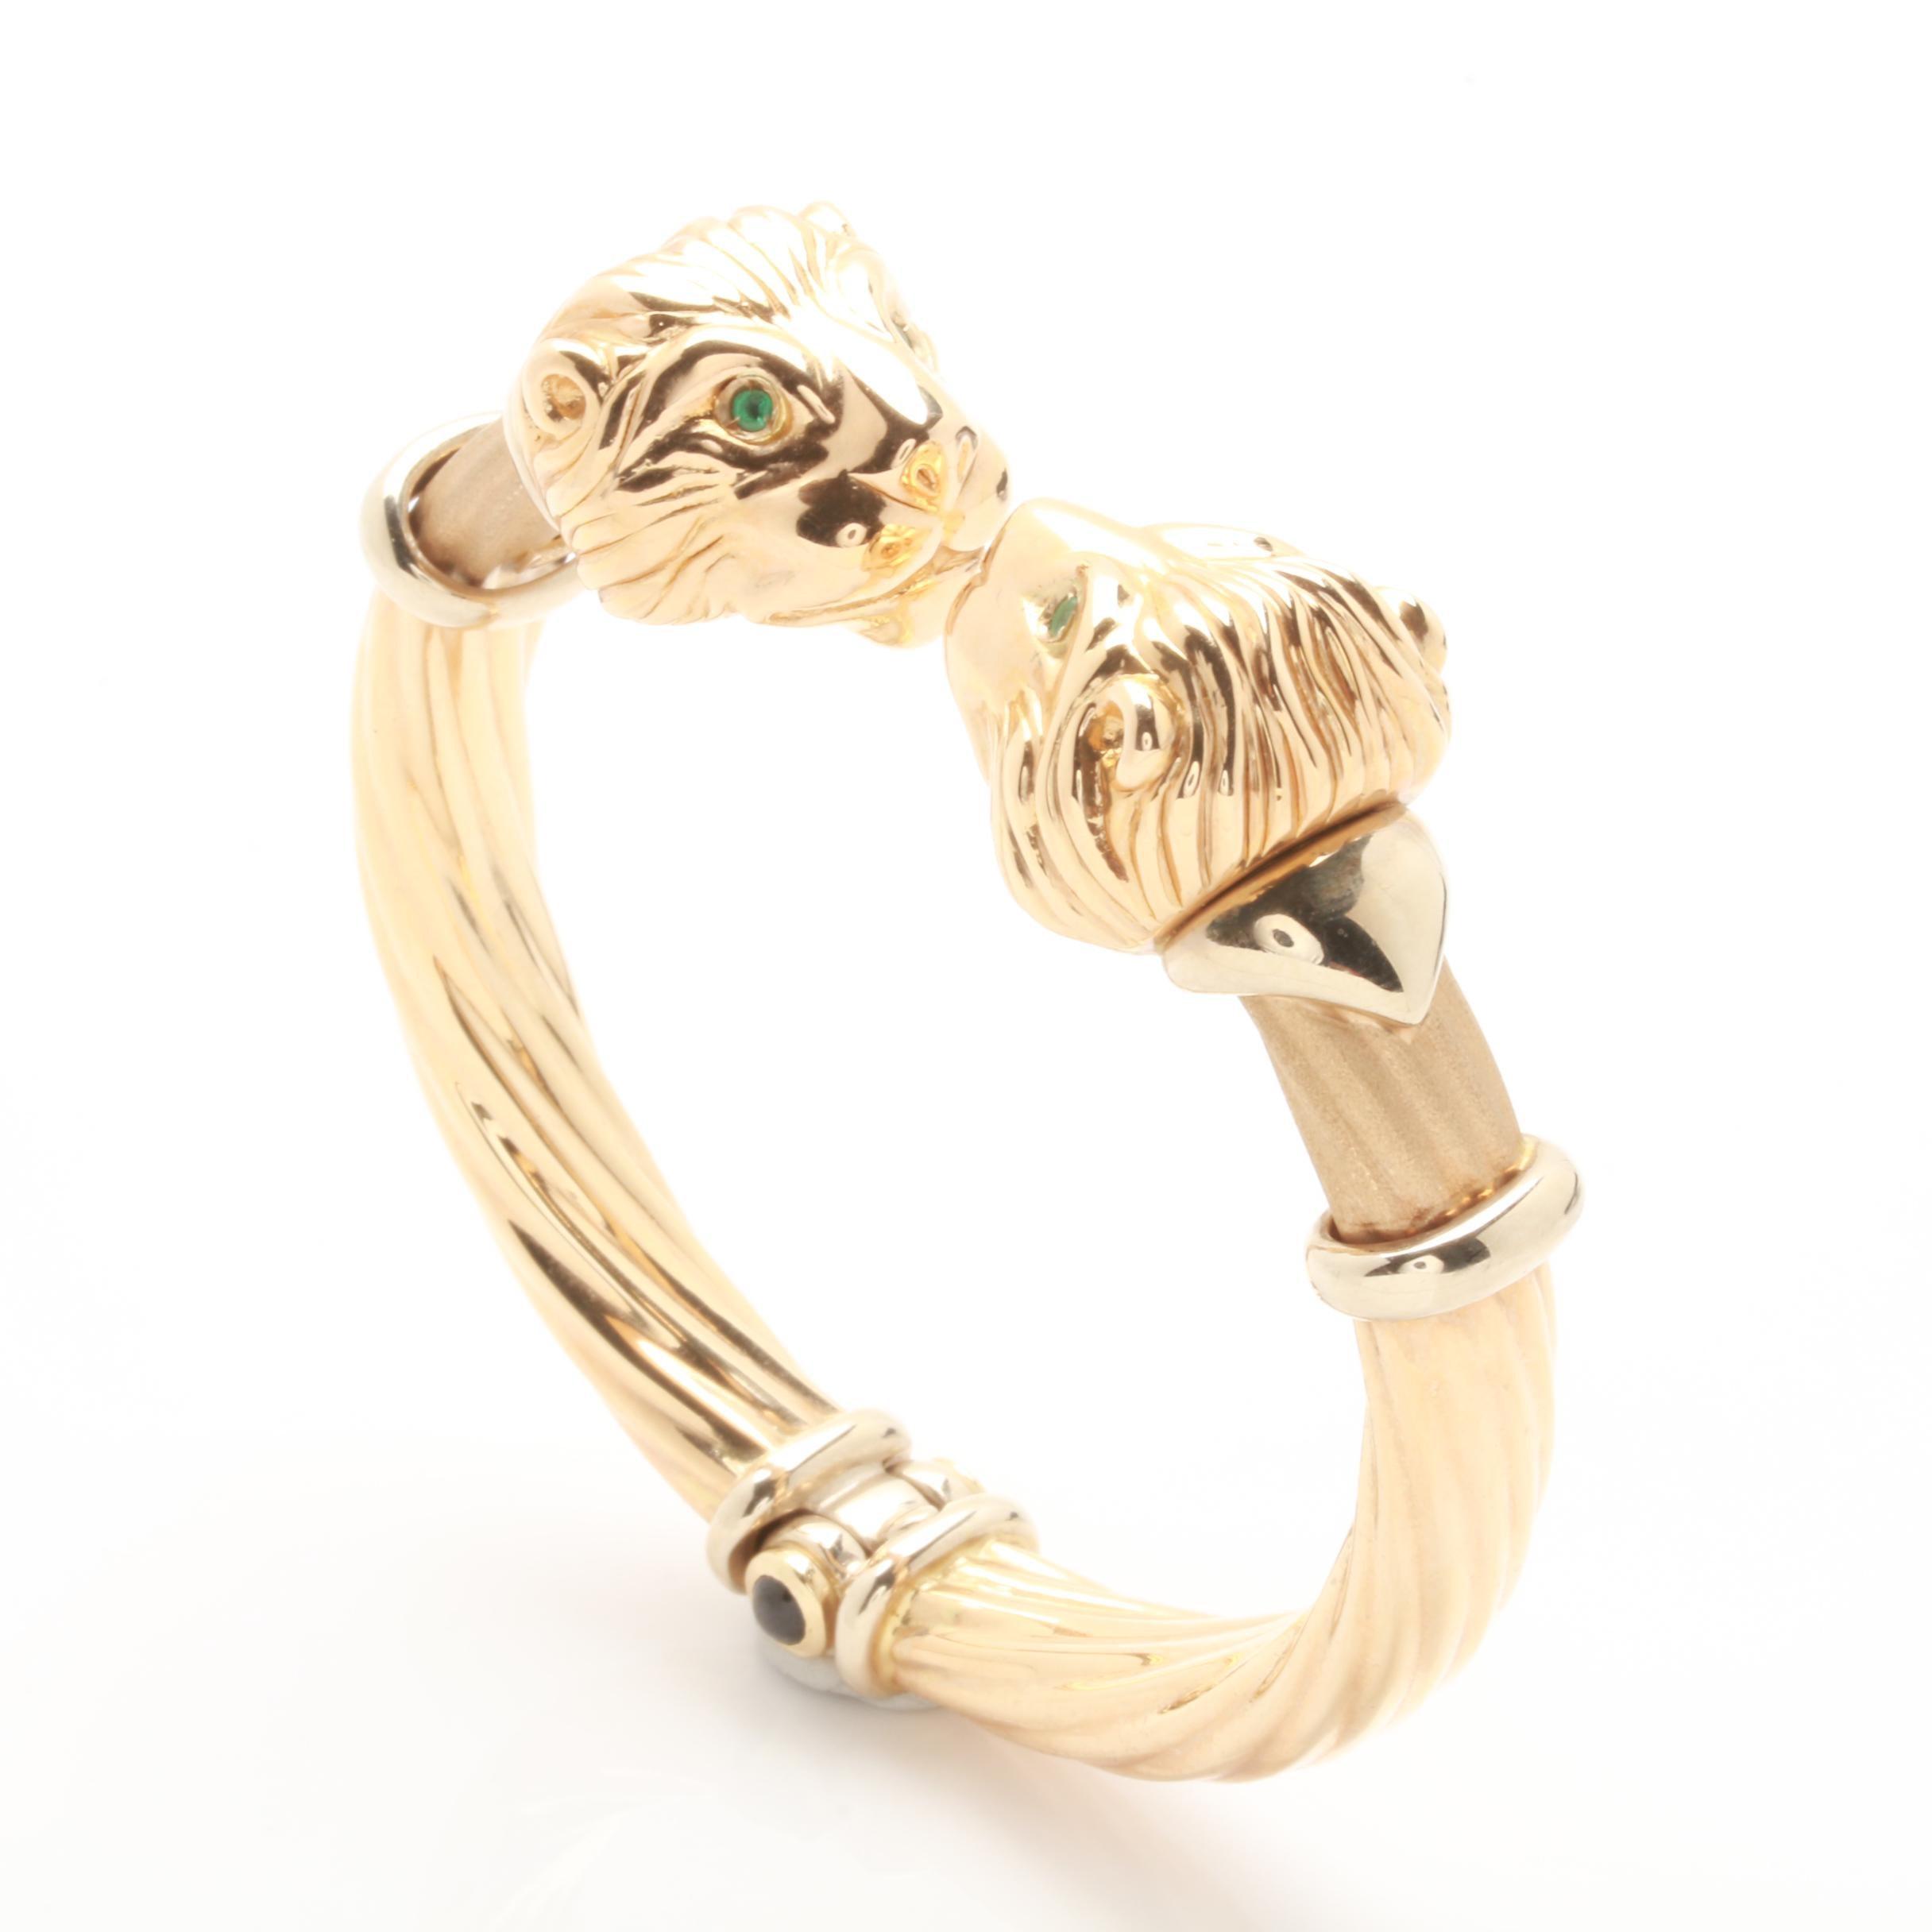 14K Yellow Gold Black Onyx and Emerald Lion's Head Cuff